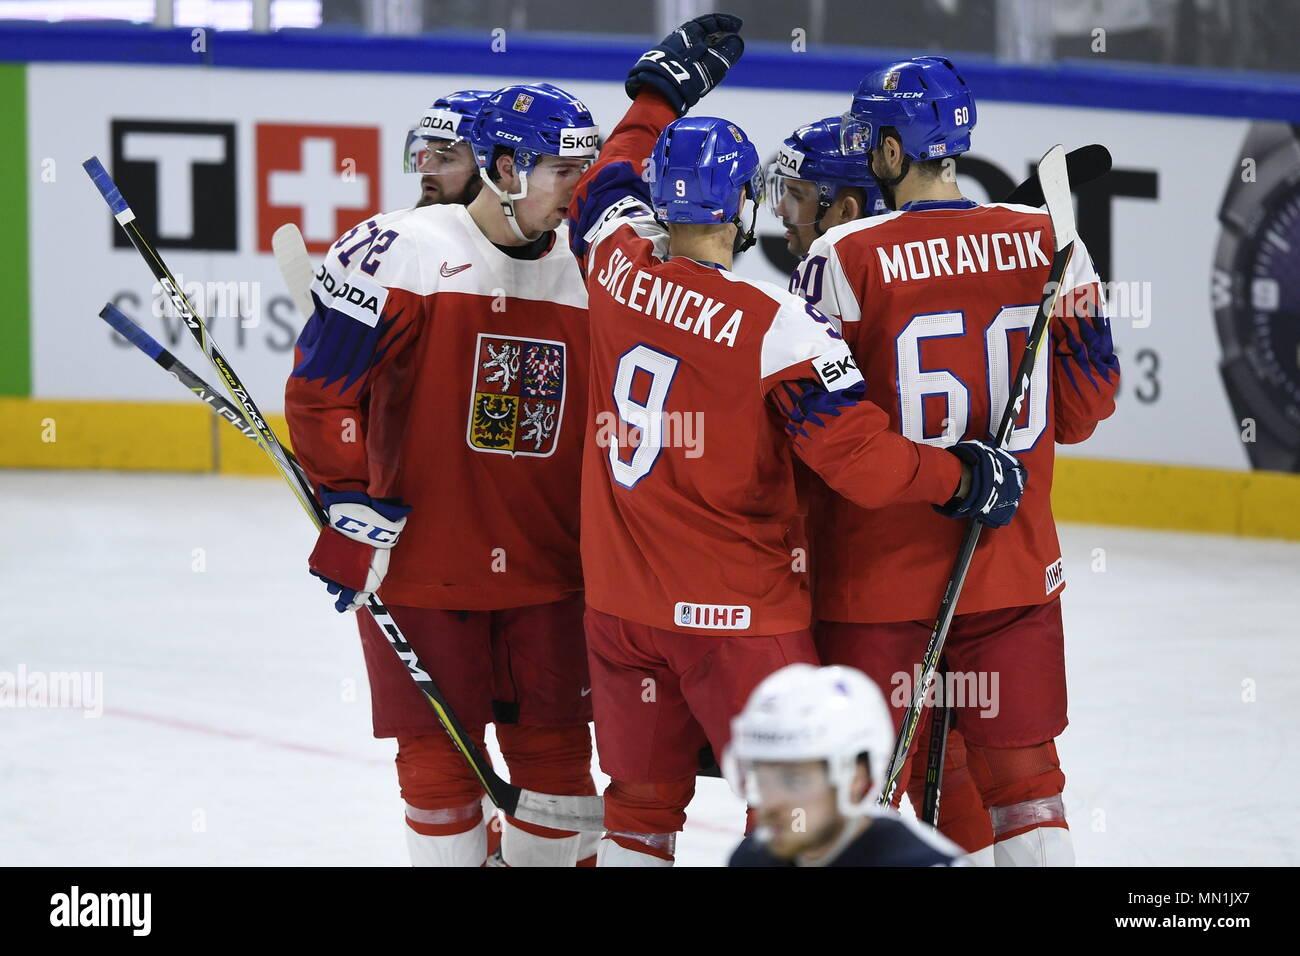 Kodan, Denmark. 13th May, 2018. L-R ROMAN HORAK, FILIP CHYTIL, DAVID SKLENICKA and TOMAS PLEKANEC (all CZE) celebrate 5th goal during the Ice Hockey World Championships match France vs Czech Republic, in Copenhagen, Denmark, May 13, 2018. Credit: Ondrej Deml/CTK Photo/Alamy Live News Stock Photo